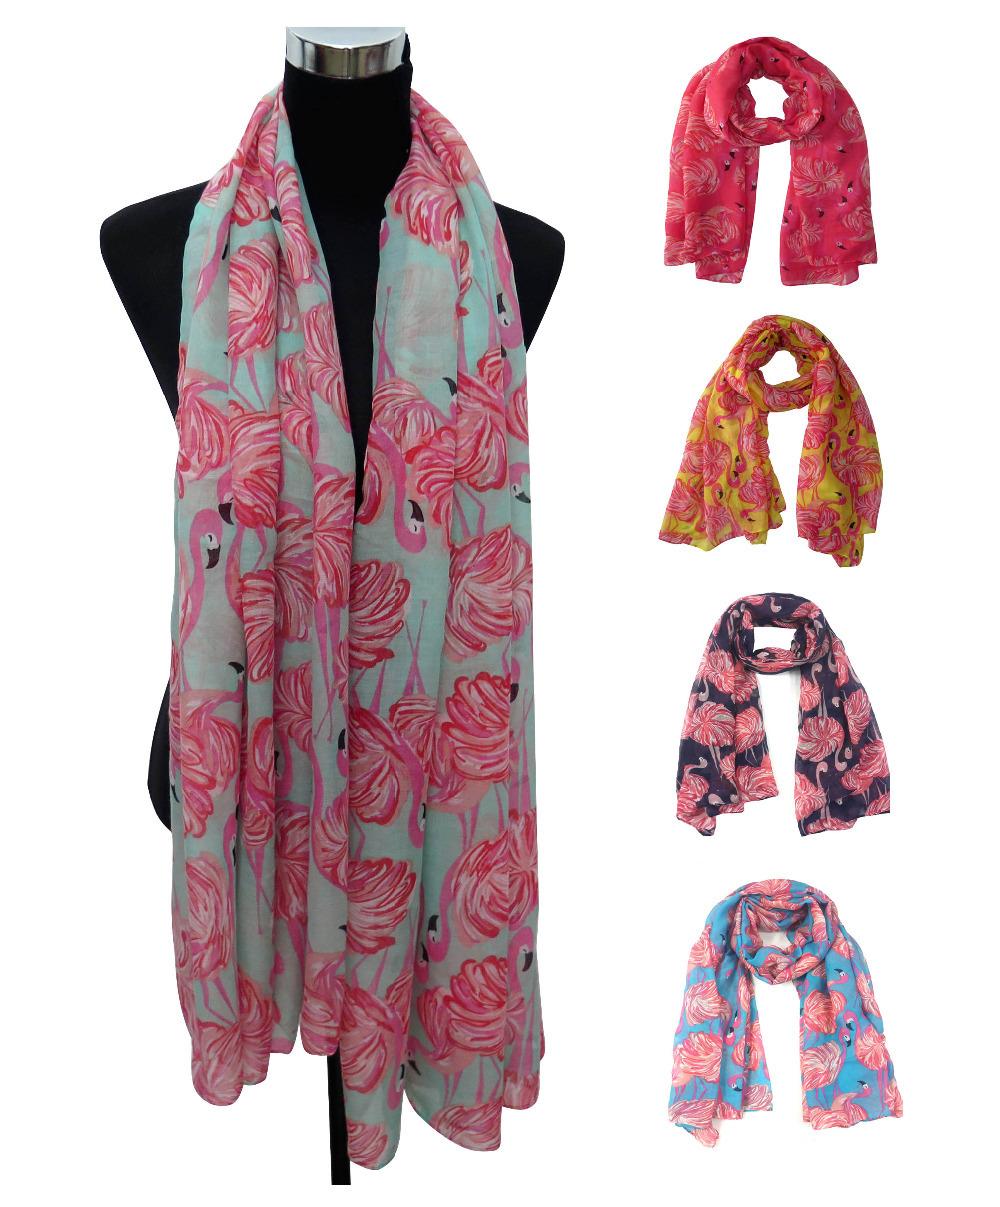 Vintage Flamingo Print Women's Large Scarf Shawl Wrap Gift, Free Shipping(China (Mainland))